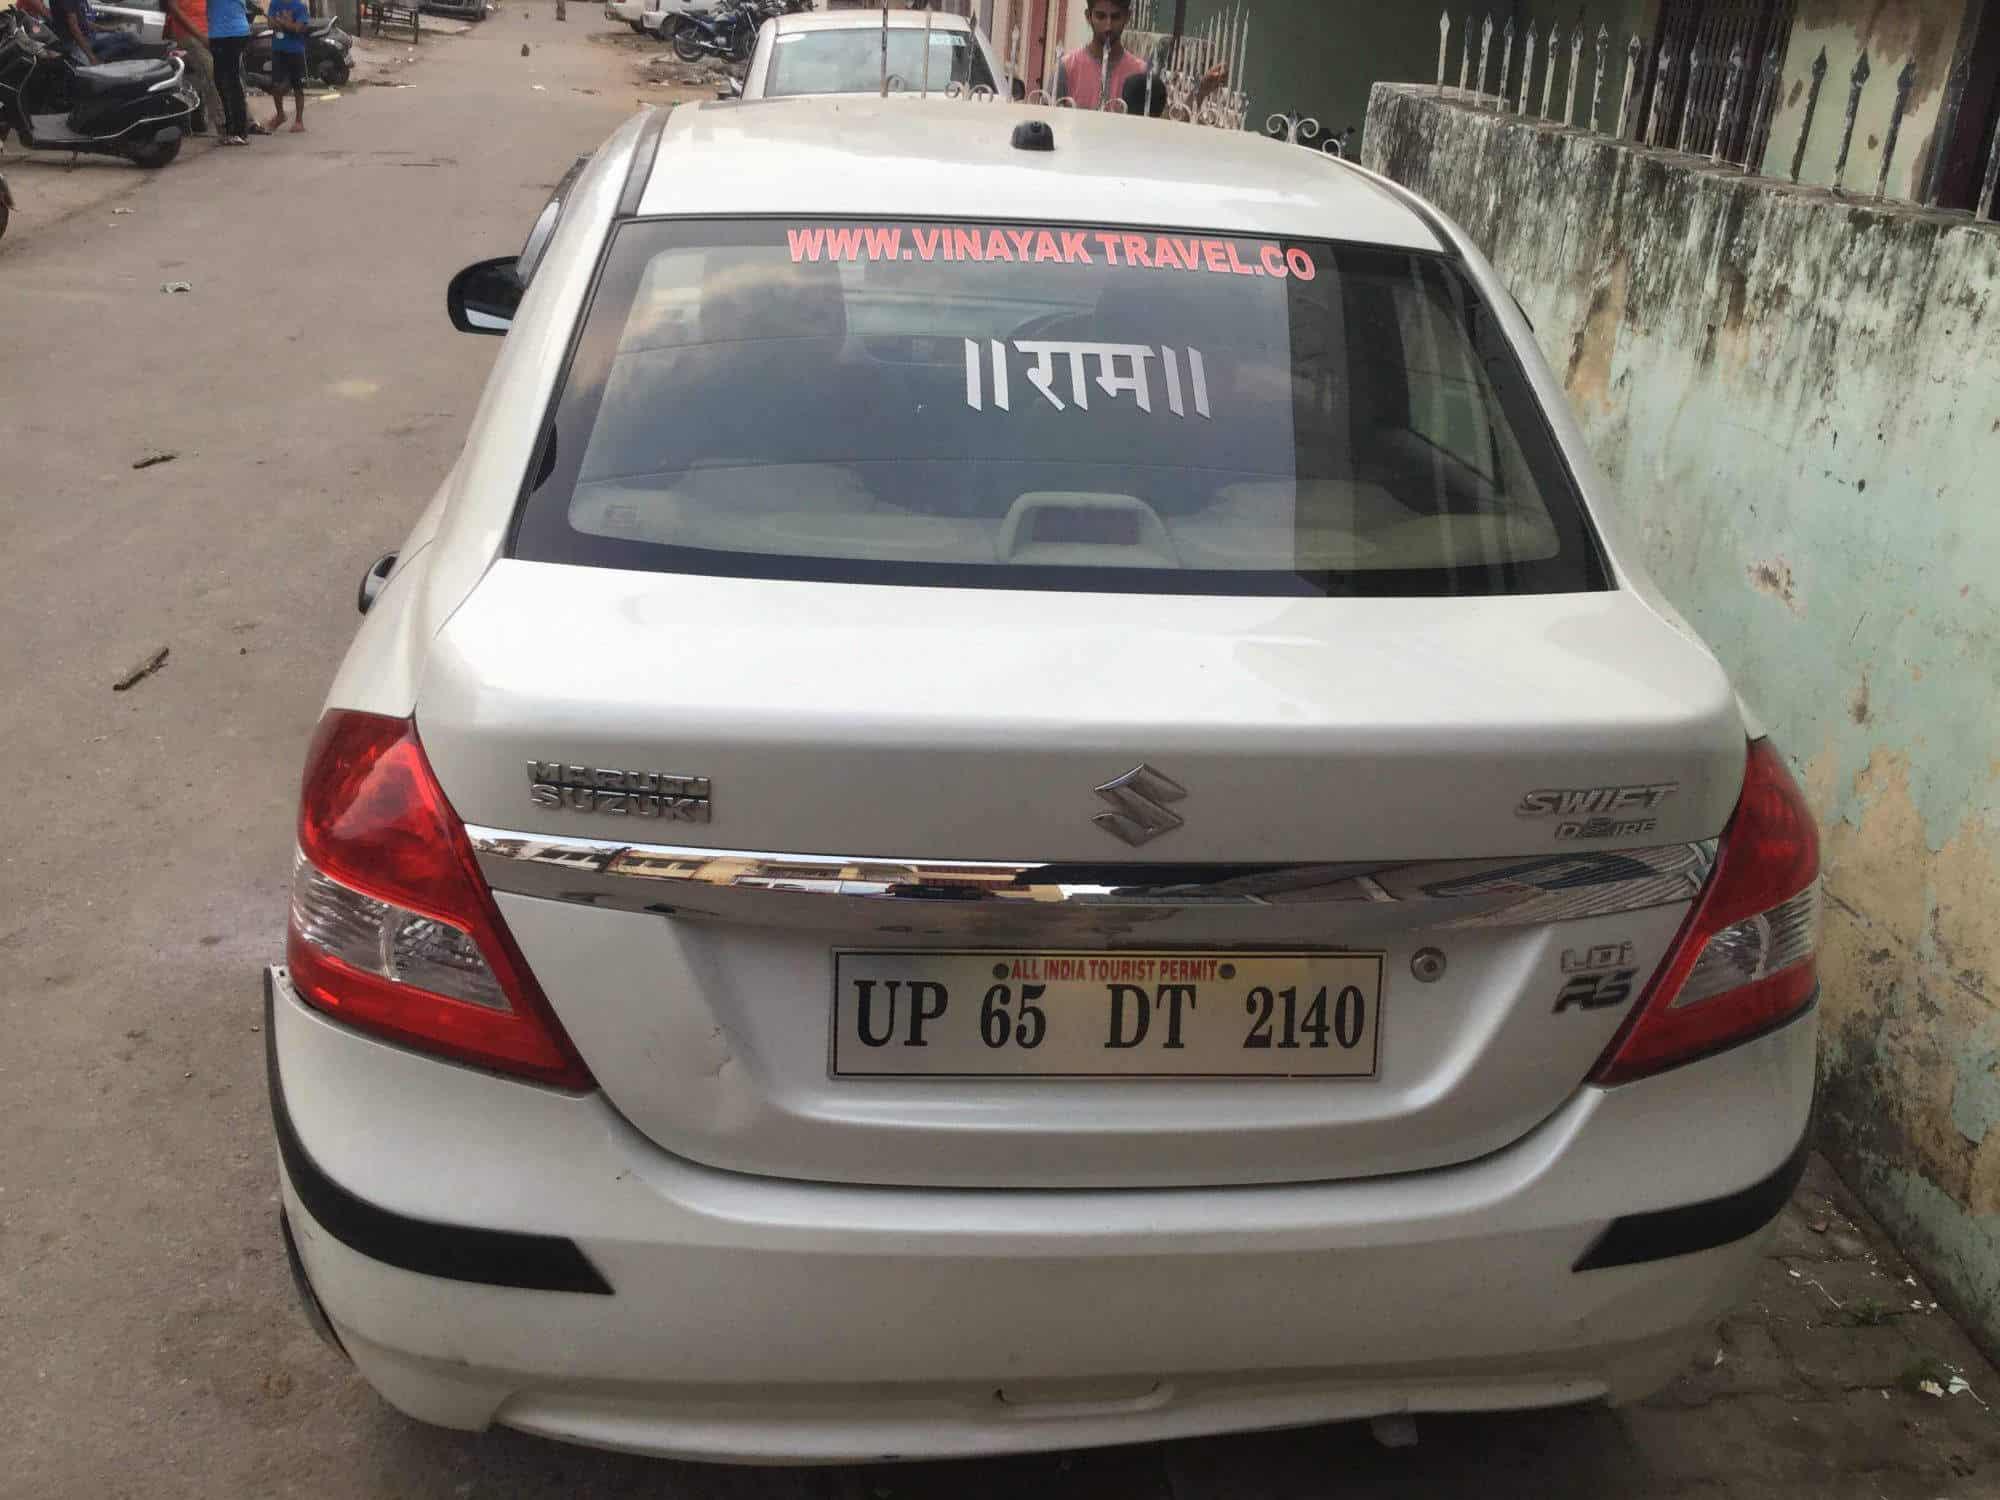 Vinayak Travels Sigra Bus Services In Varanasi Justdial